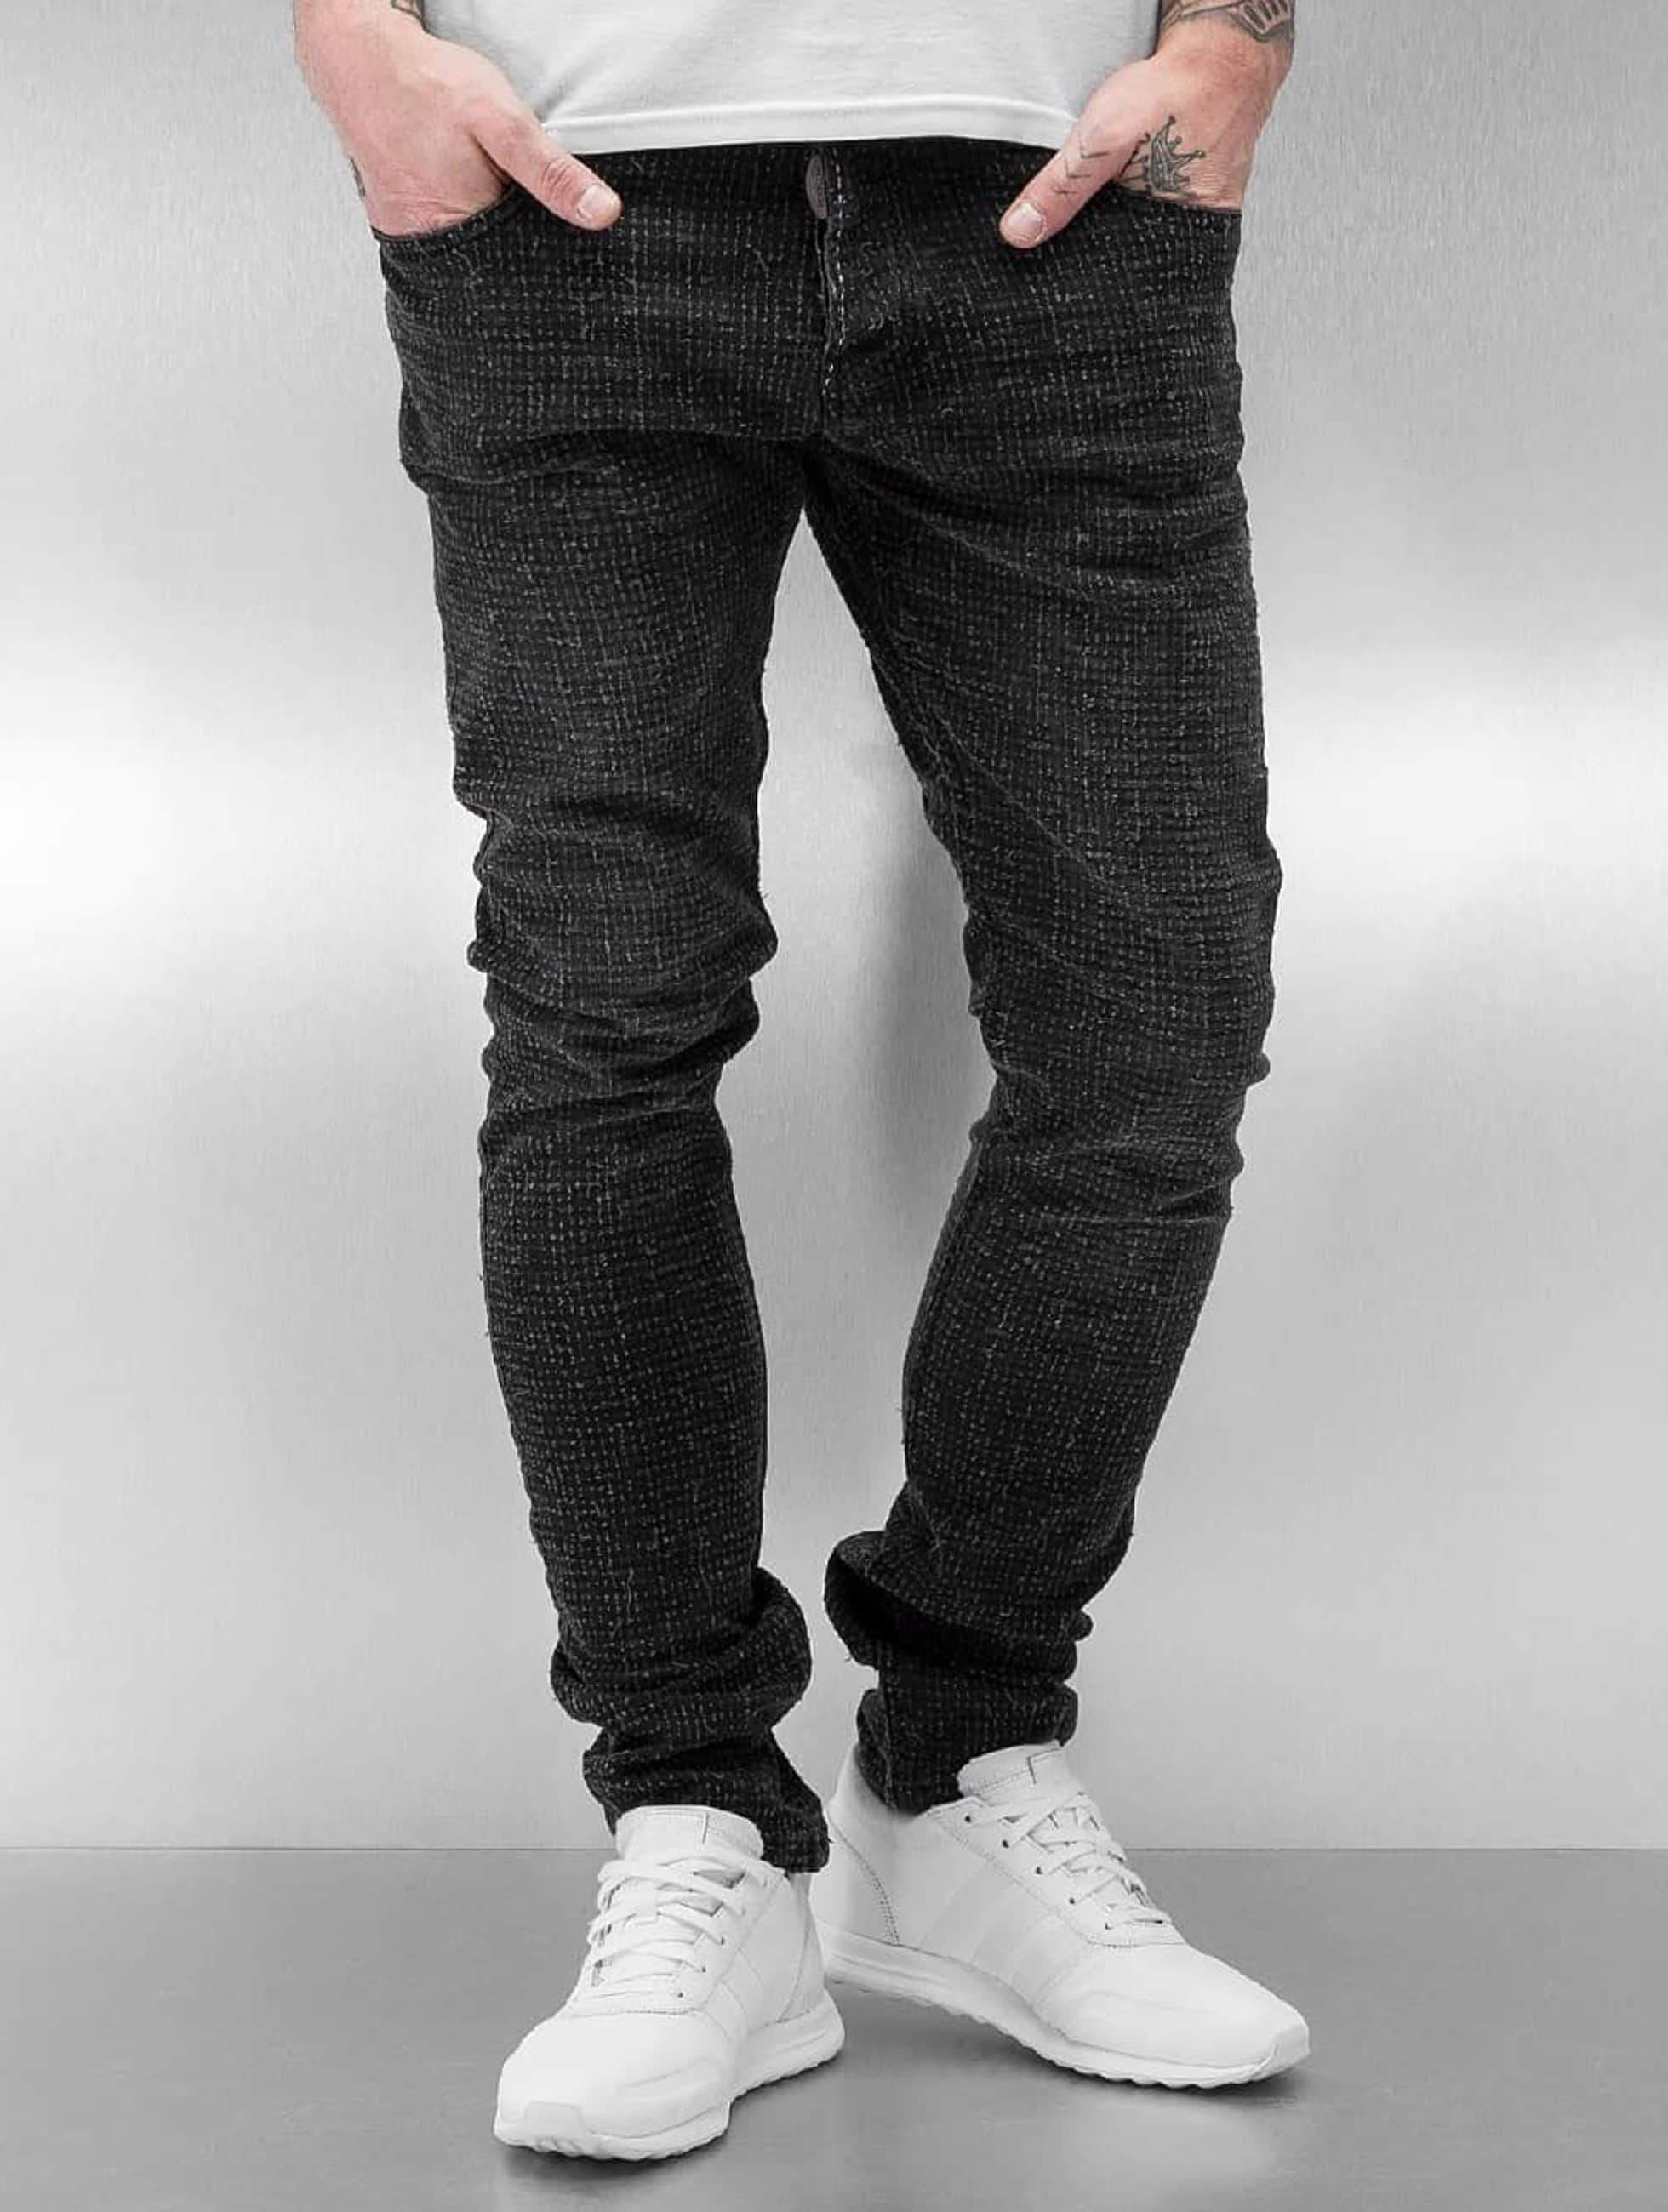 2Y / Skinny Jeans Svaki in black W 36